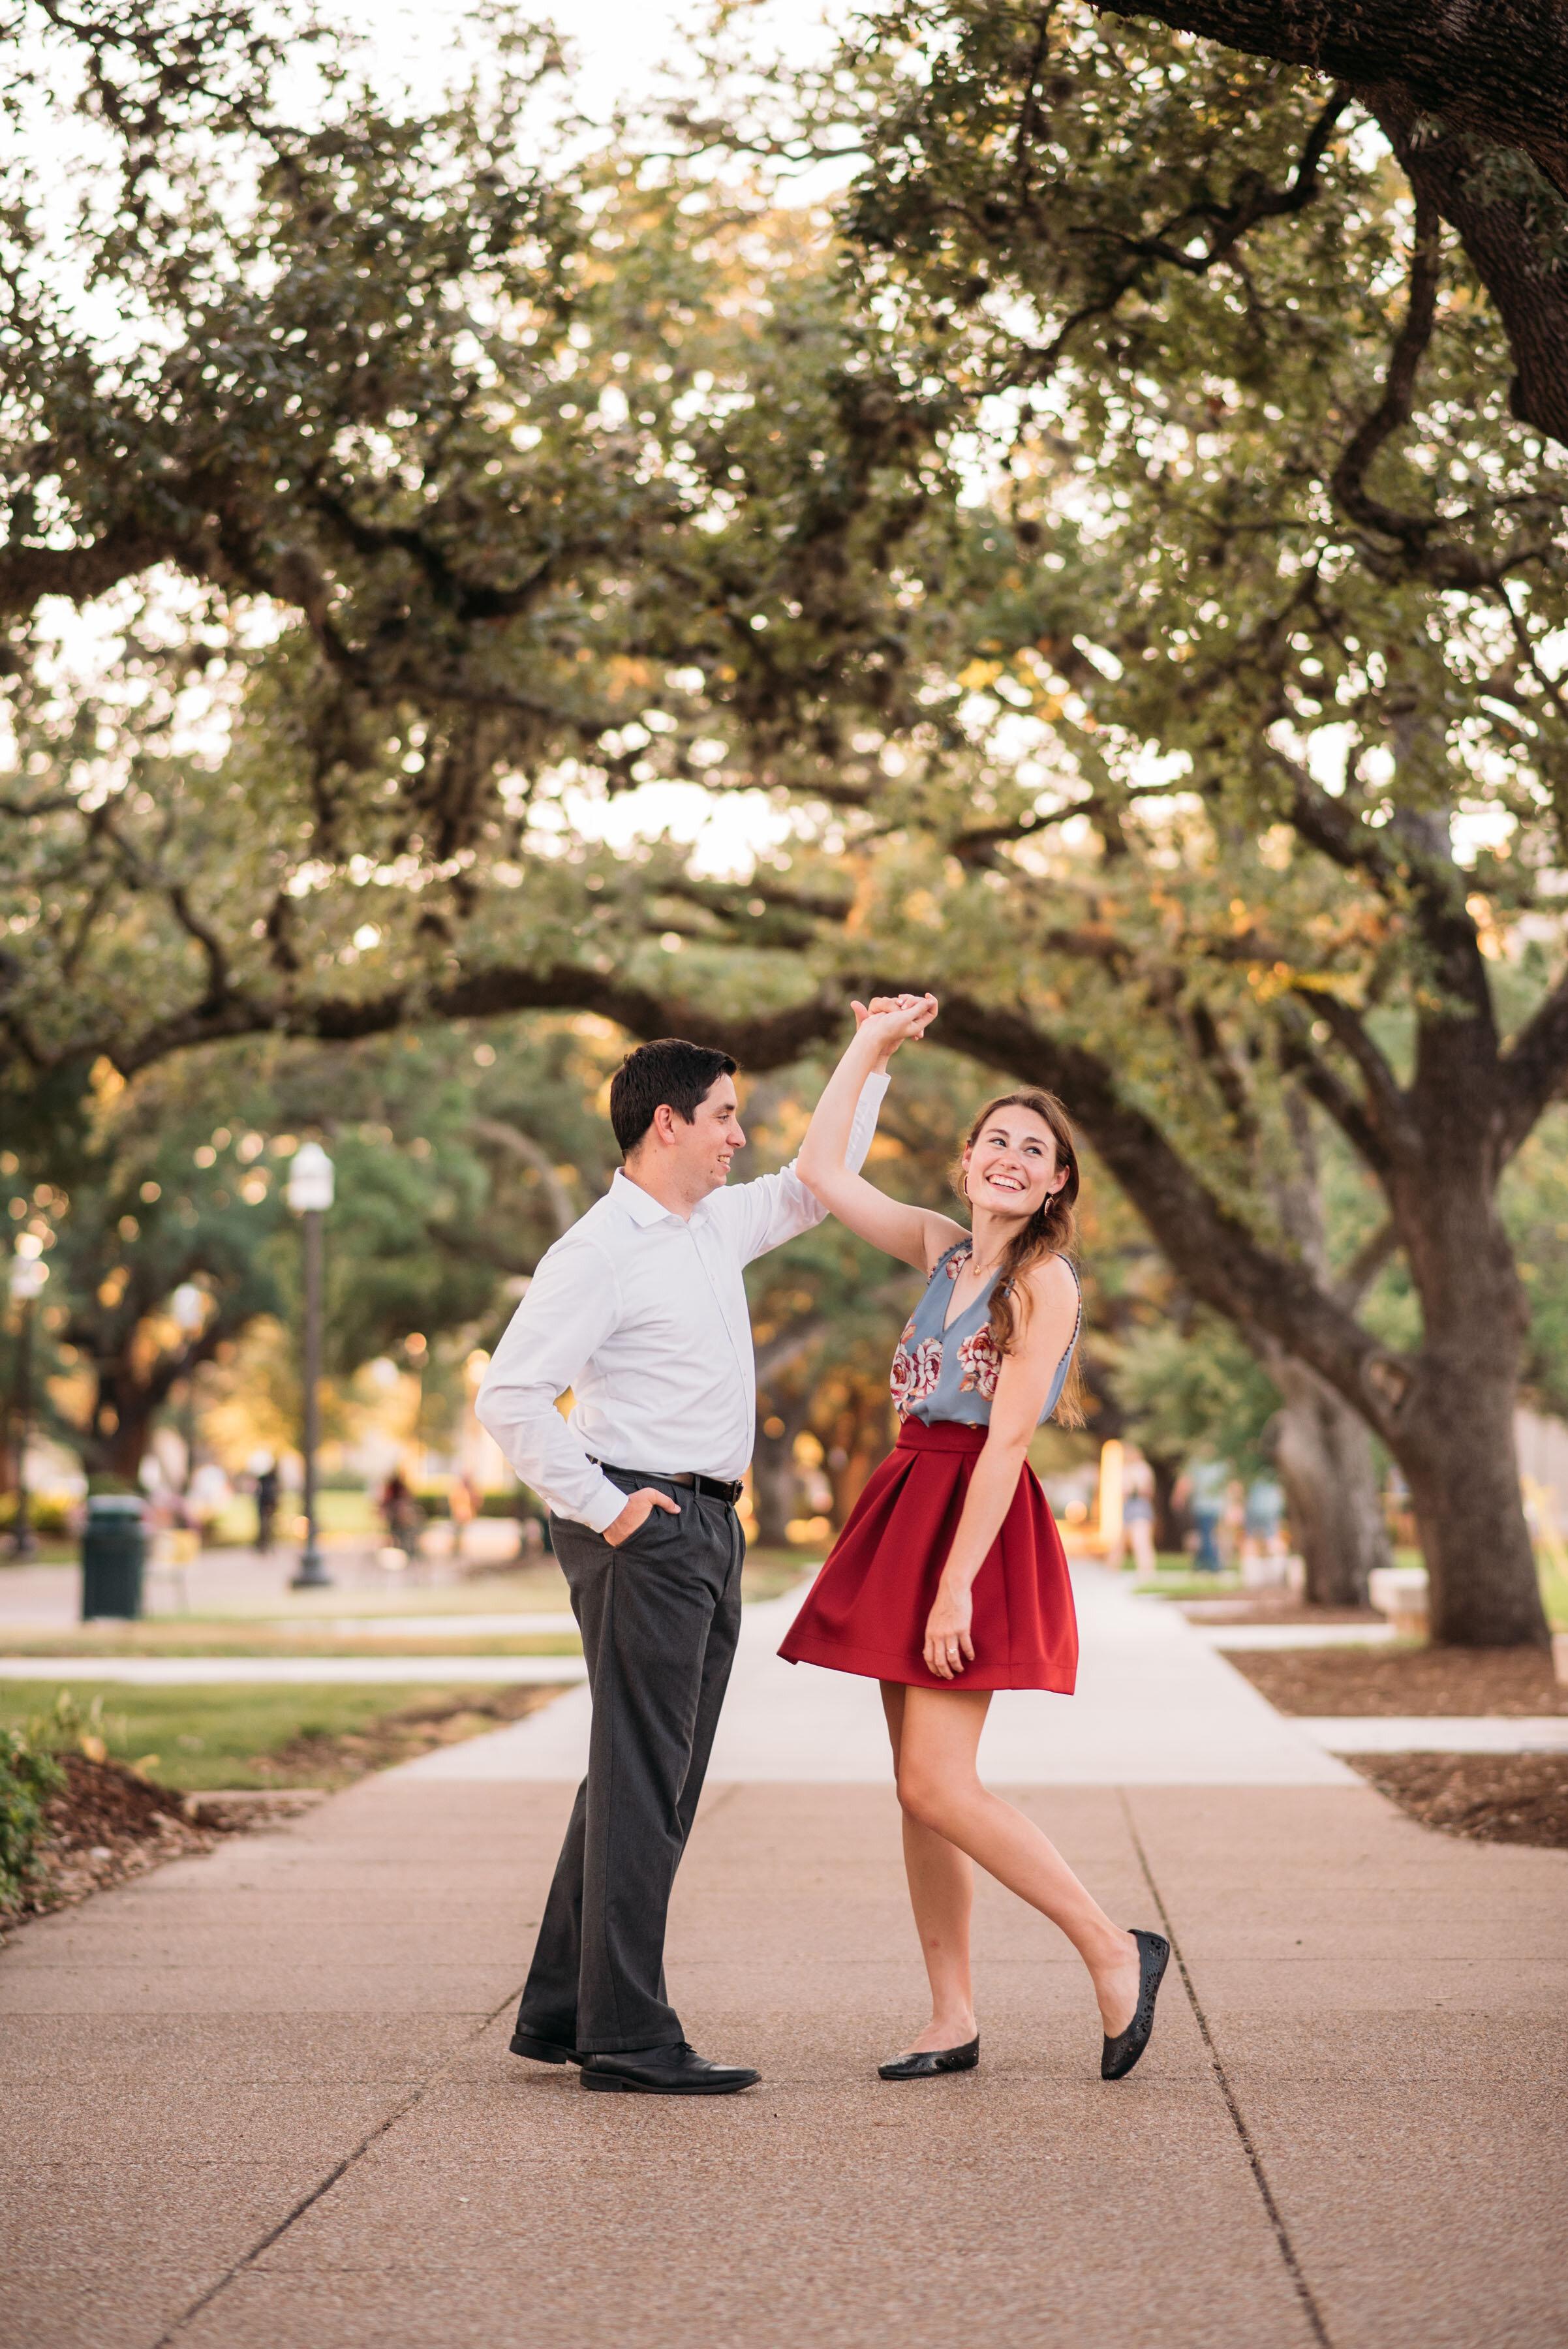 Texas-A&M-University-Engagement-Session-Century-Tree-Military-Walk-College-Station-Wedding-Photographer-San-Angel-Photo-Tony-Kate-23.jpg